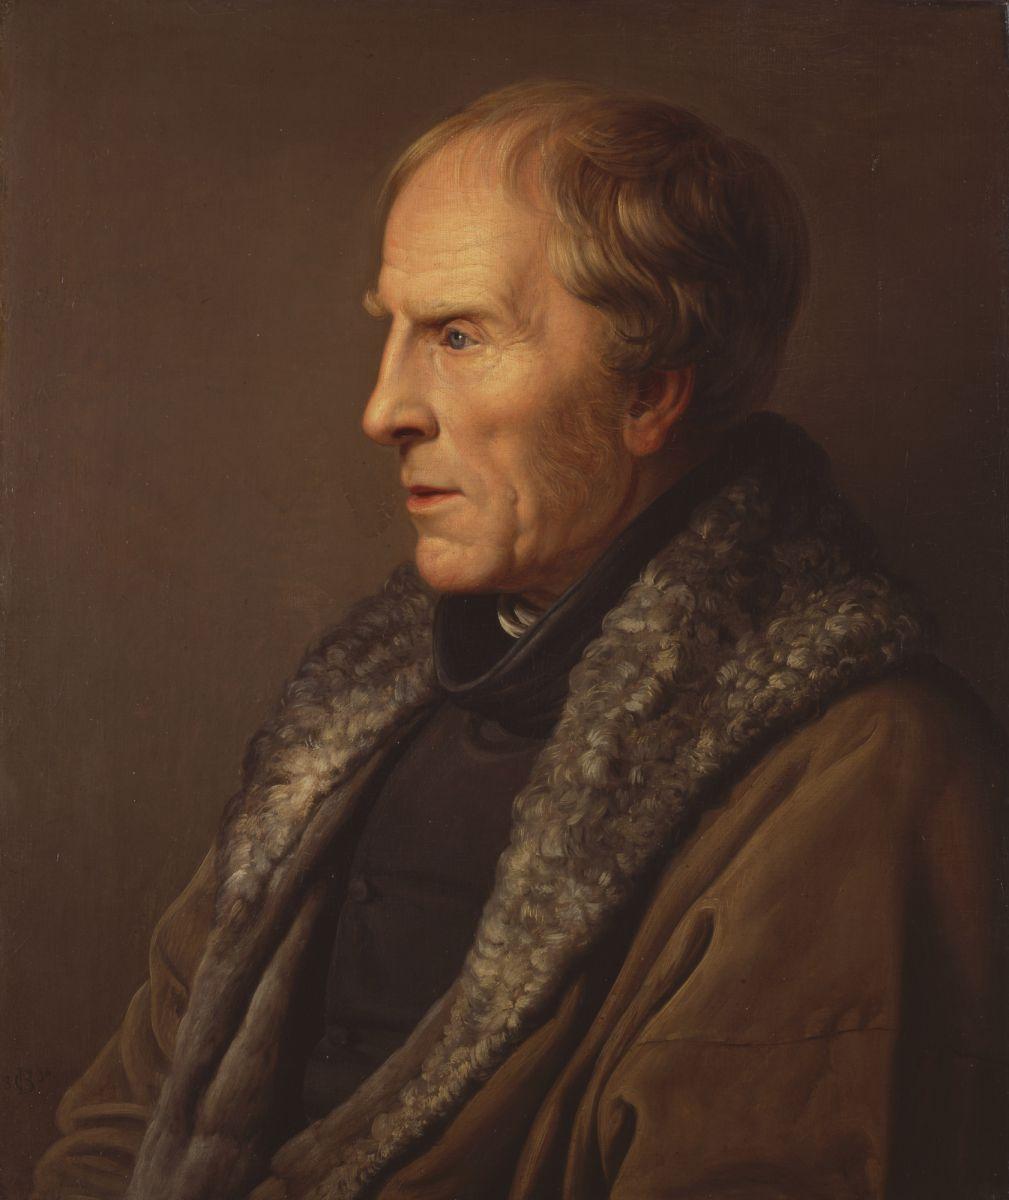 Carl Johann Baehr, Ritratto del pittore Caspar David Friedrich, 1836, Olio su tela, cm. 55,5 x 47,5